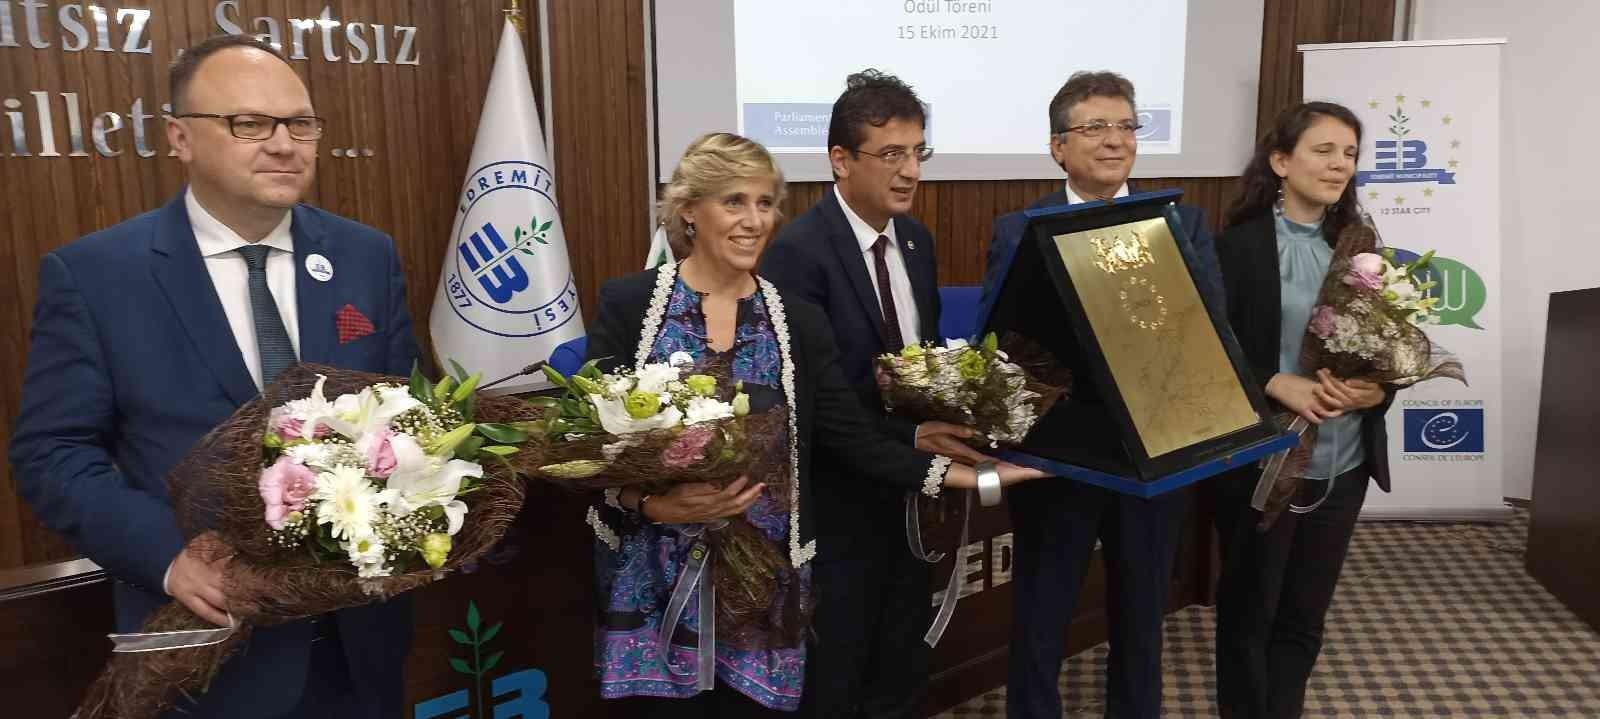 Edremit'e Avrupa Konseyi Parlamenterler Meclisi Şeref Plaketi verildi